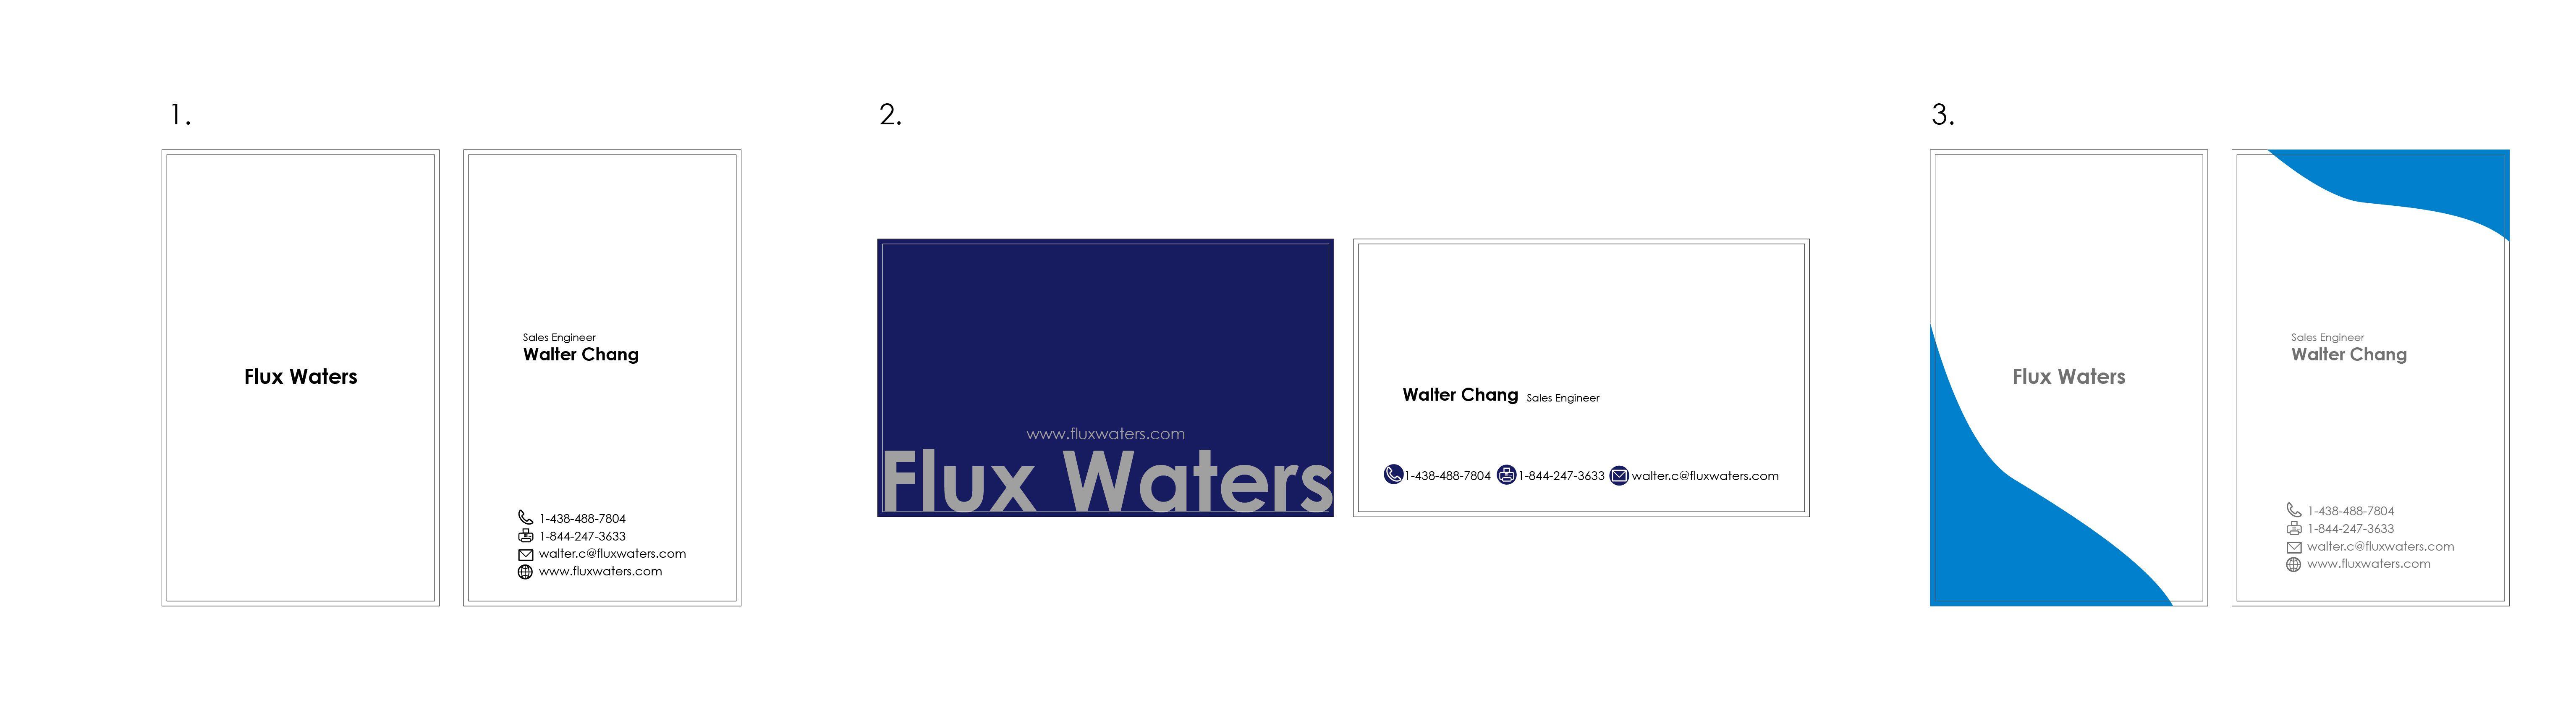 Flux Water Walter Chang  business card design